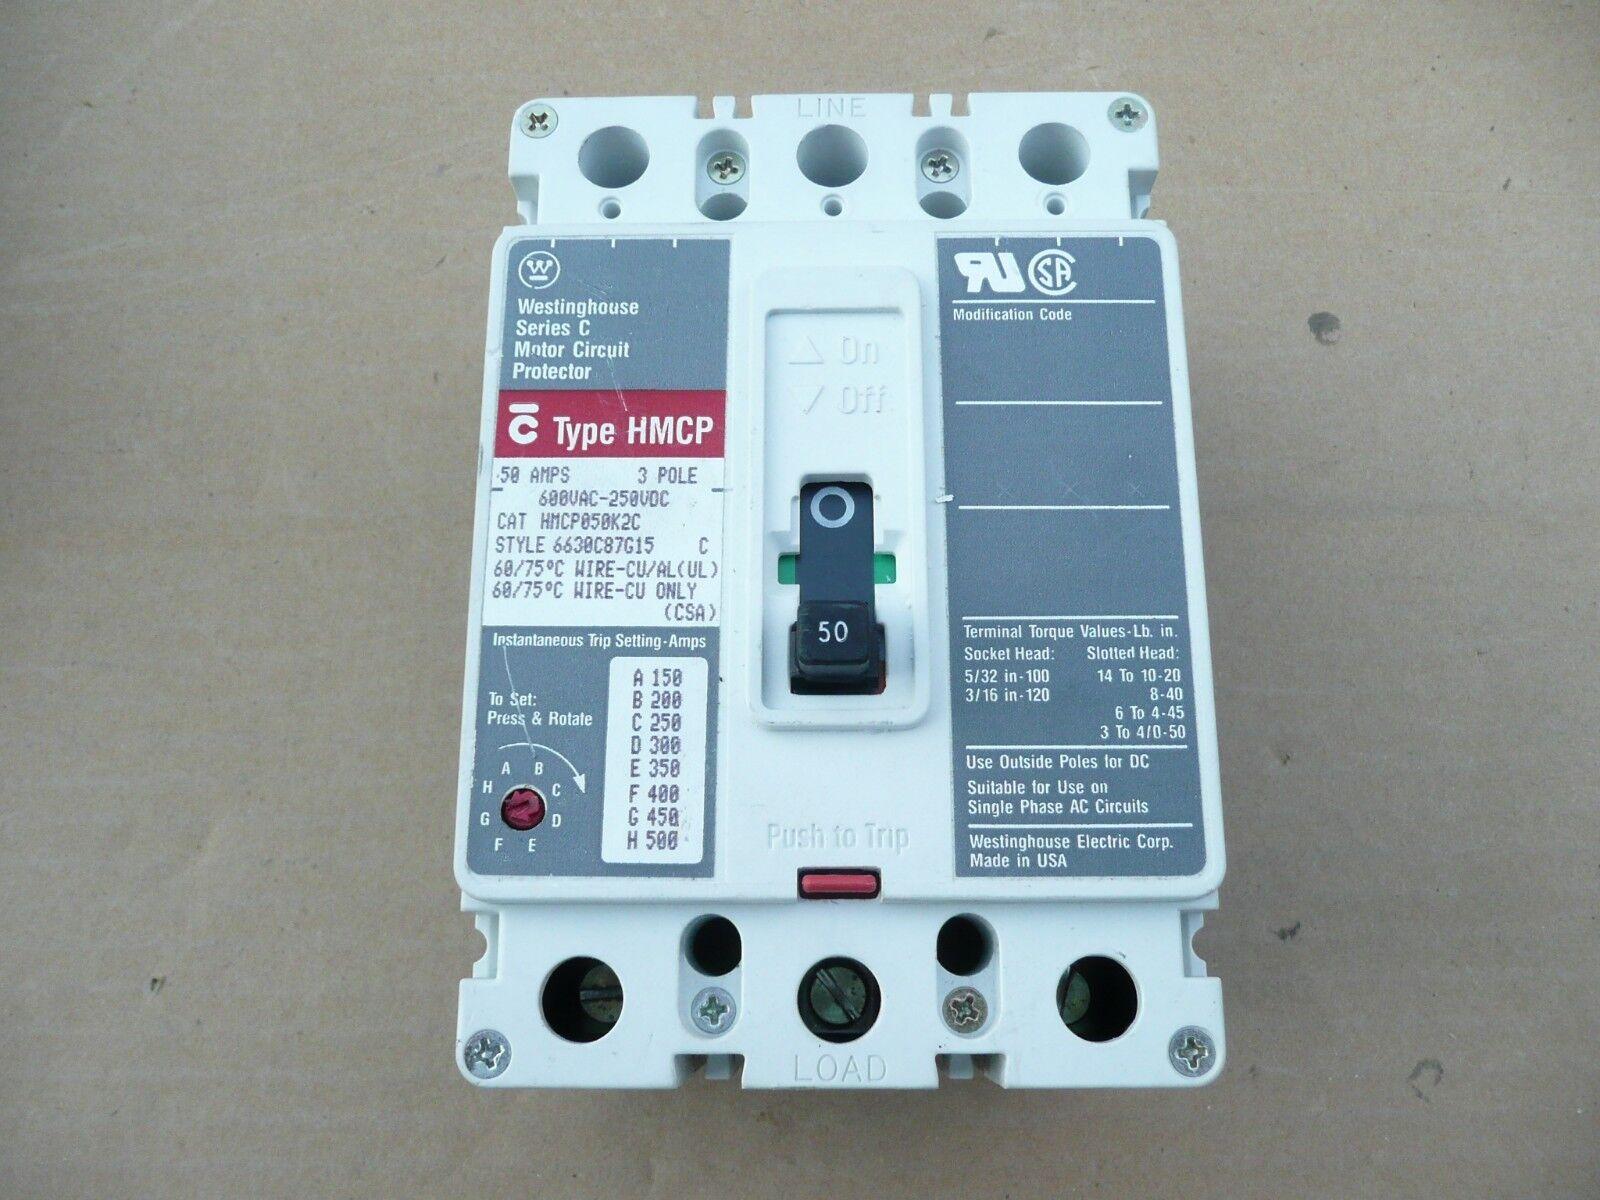 Westinghouse HMCP100R3C Industrial Control System | eBay